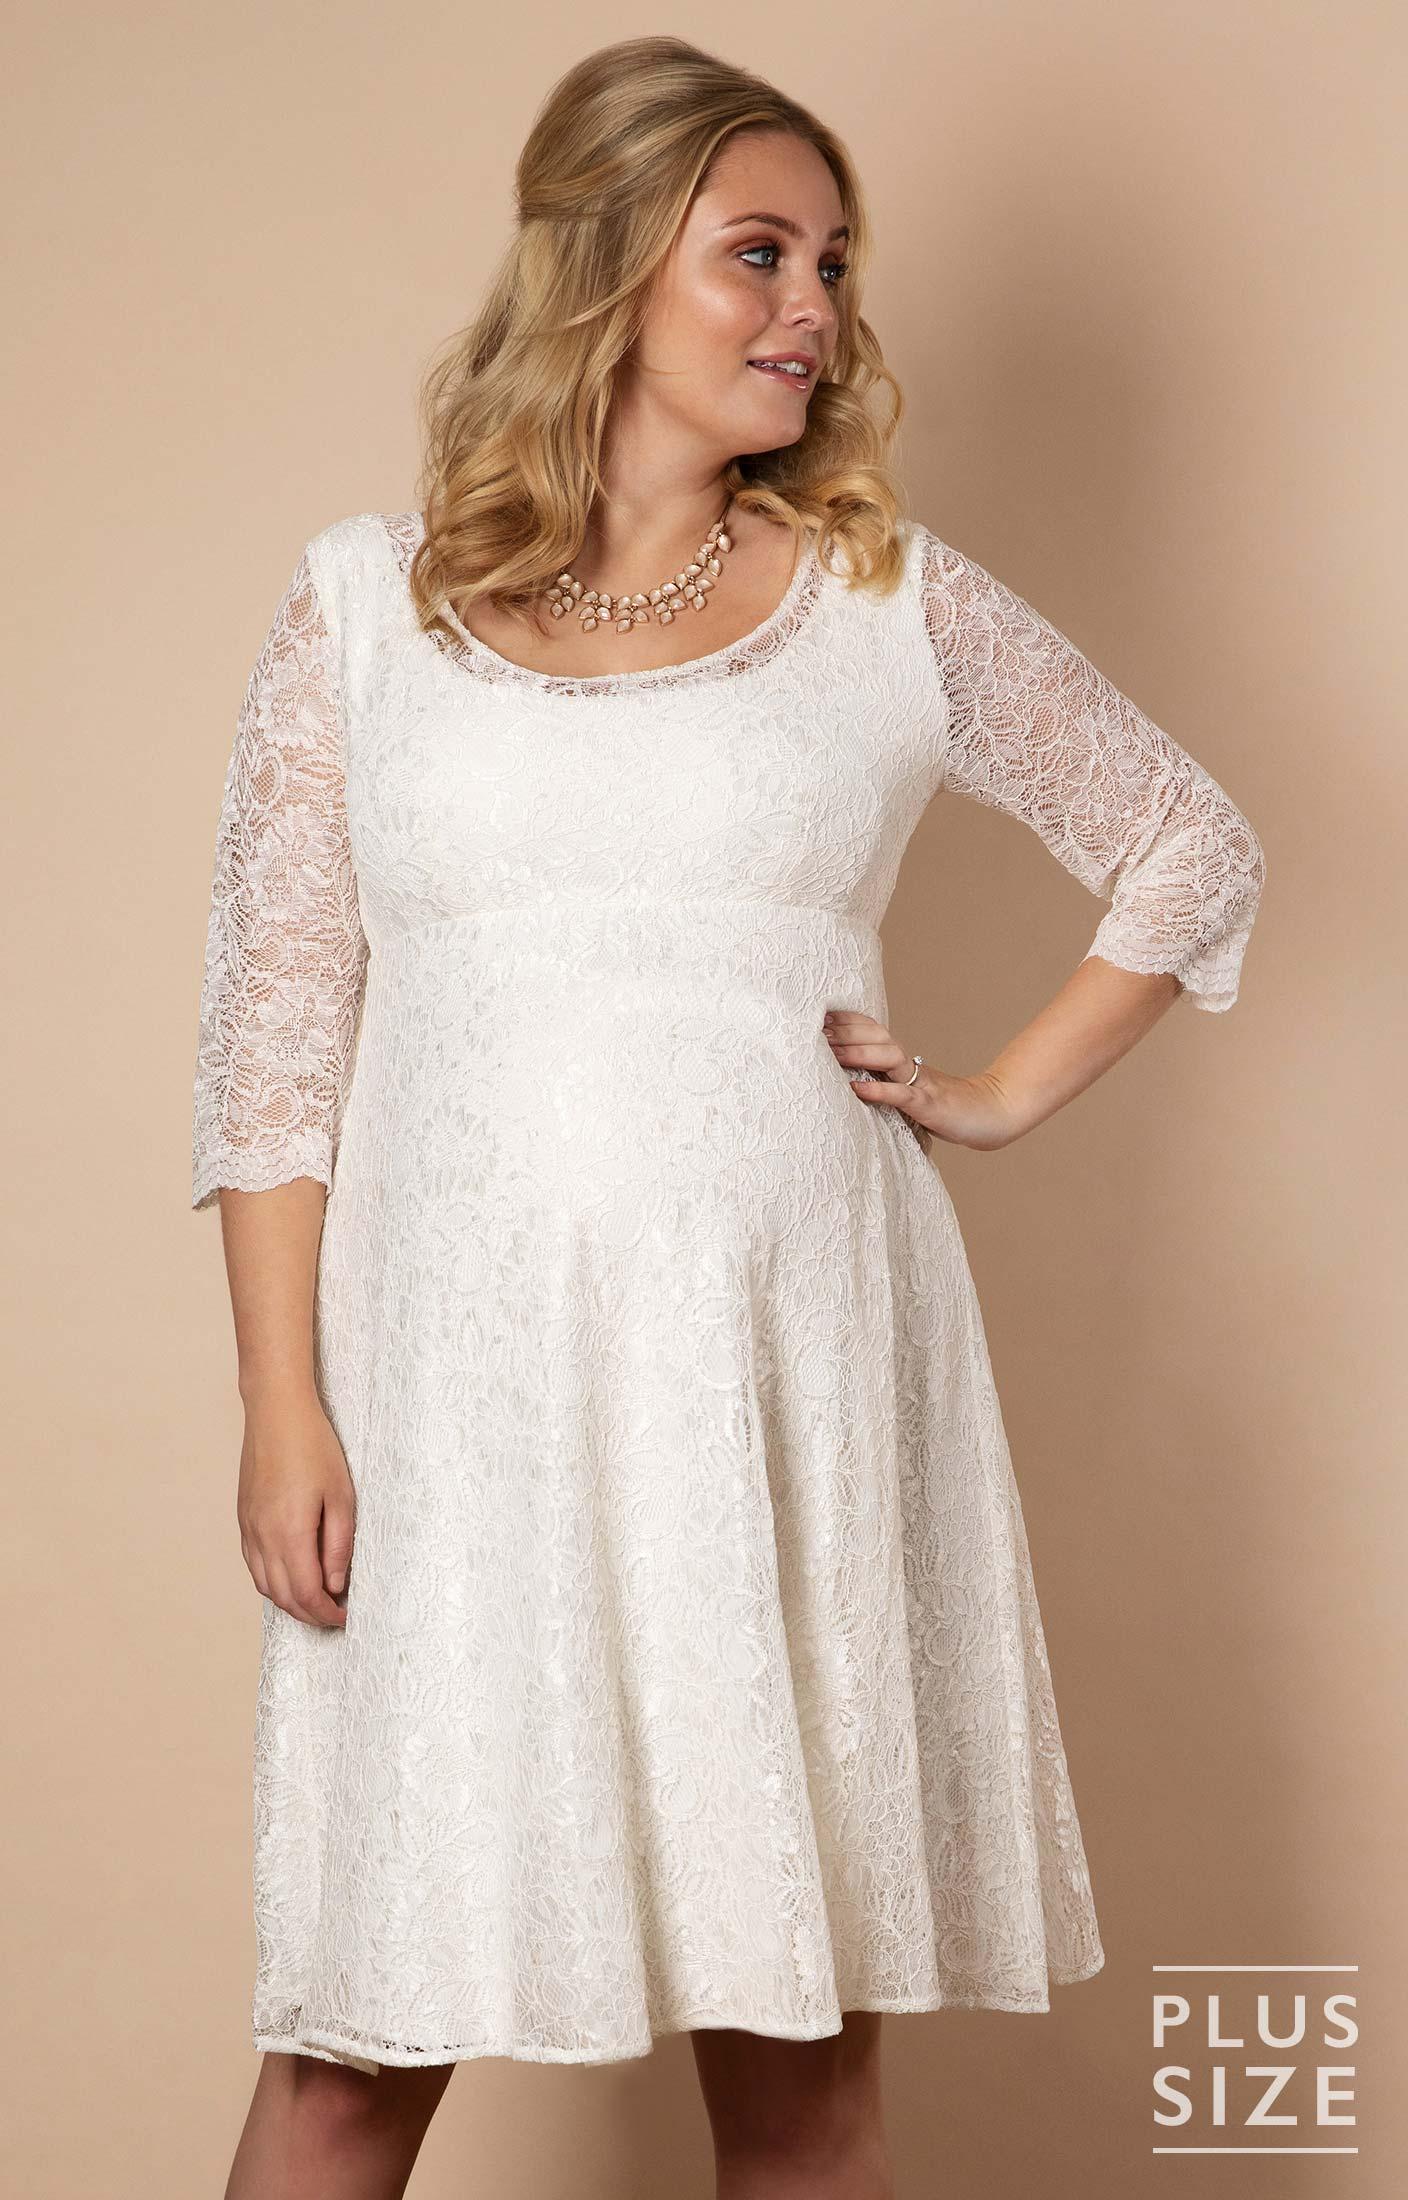 aa9cc020457 Freya Dress Short Plus Size Maternity Wedding Dress Ivory by Tiffany Rose